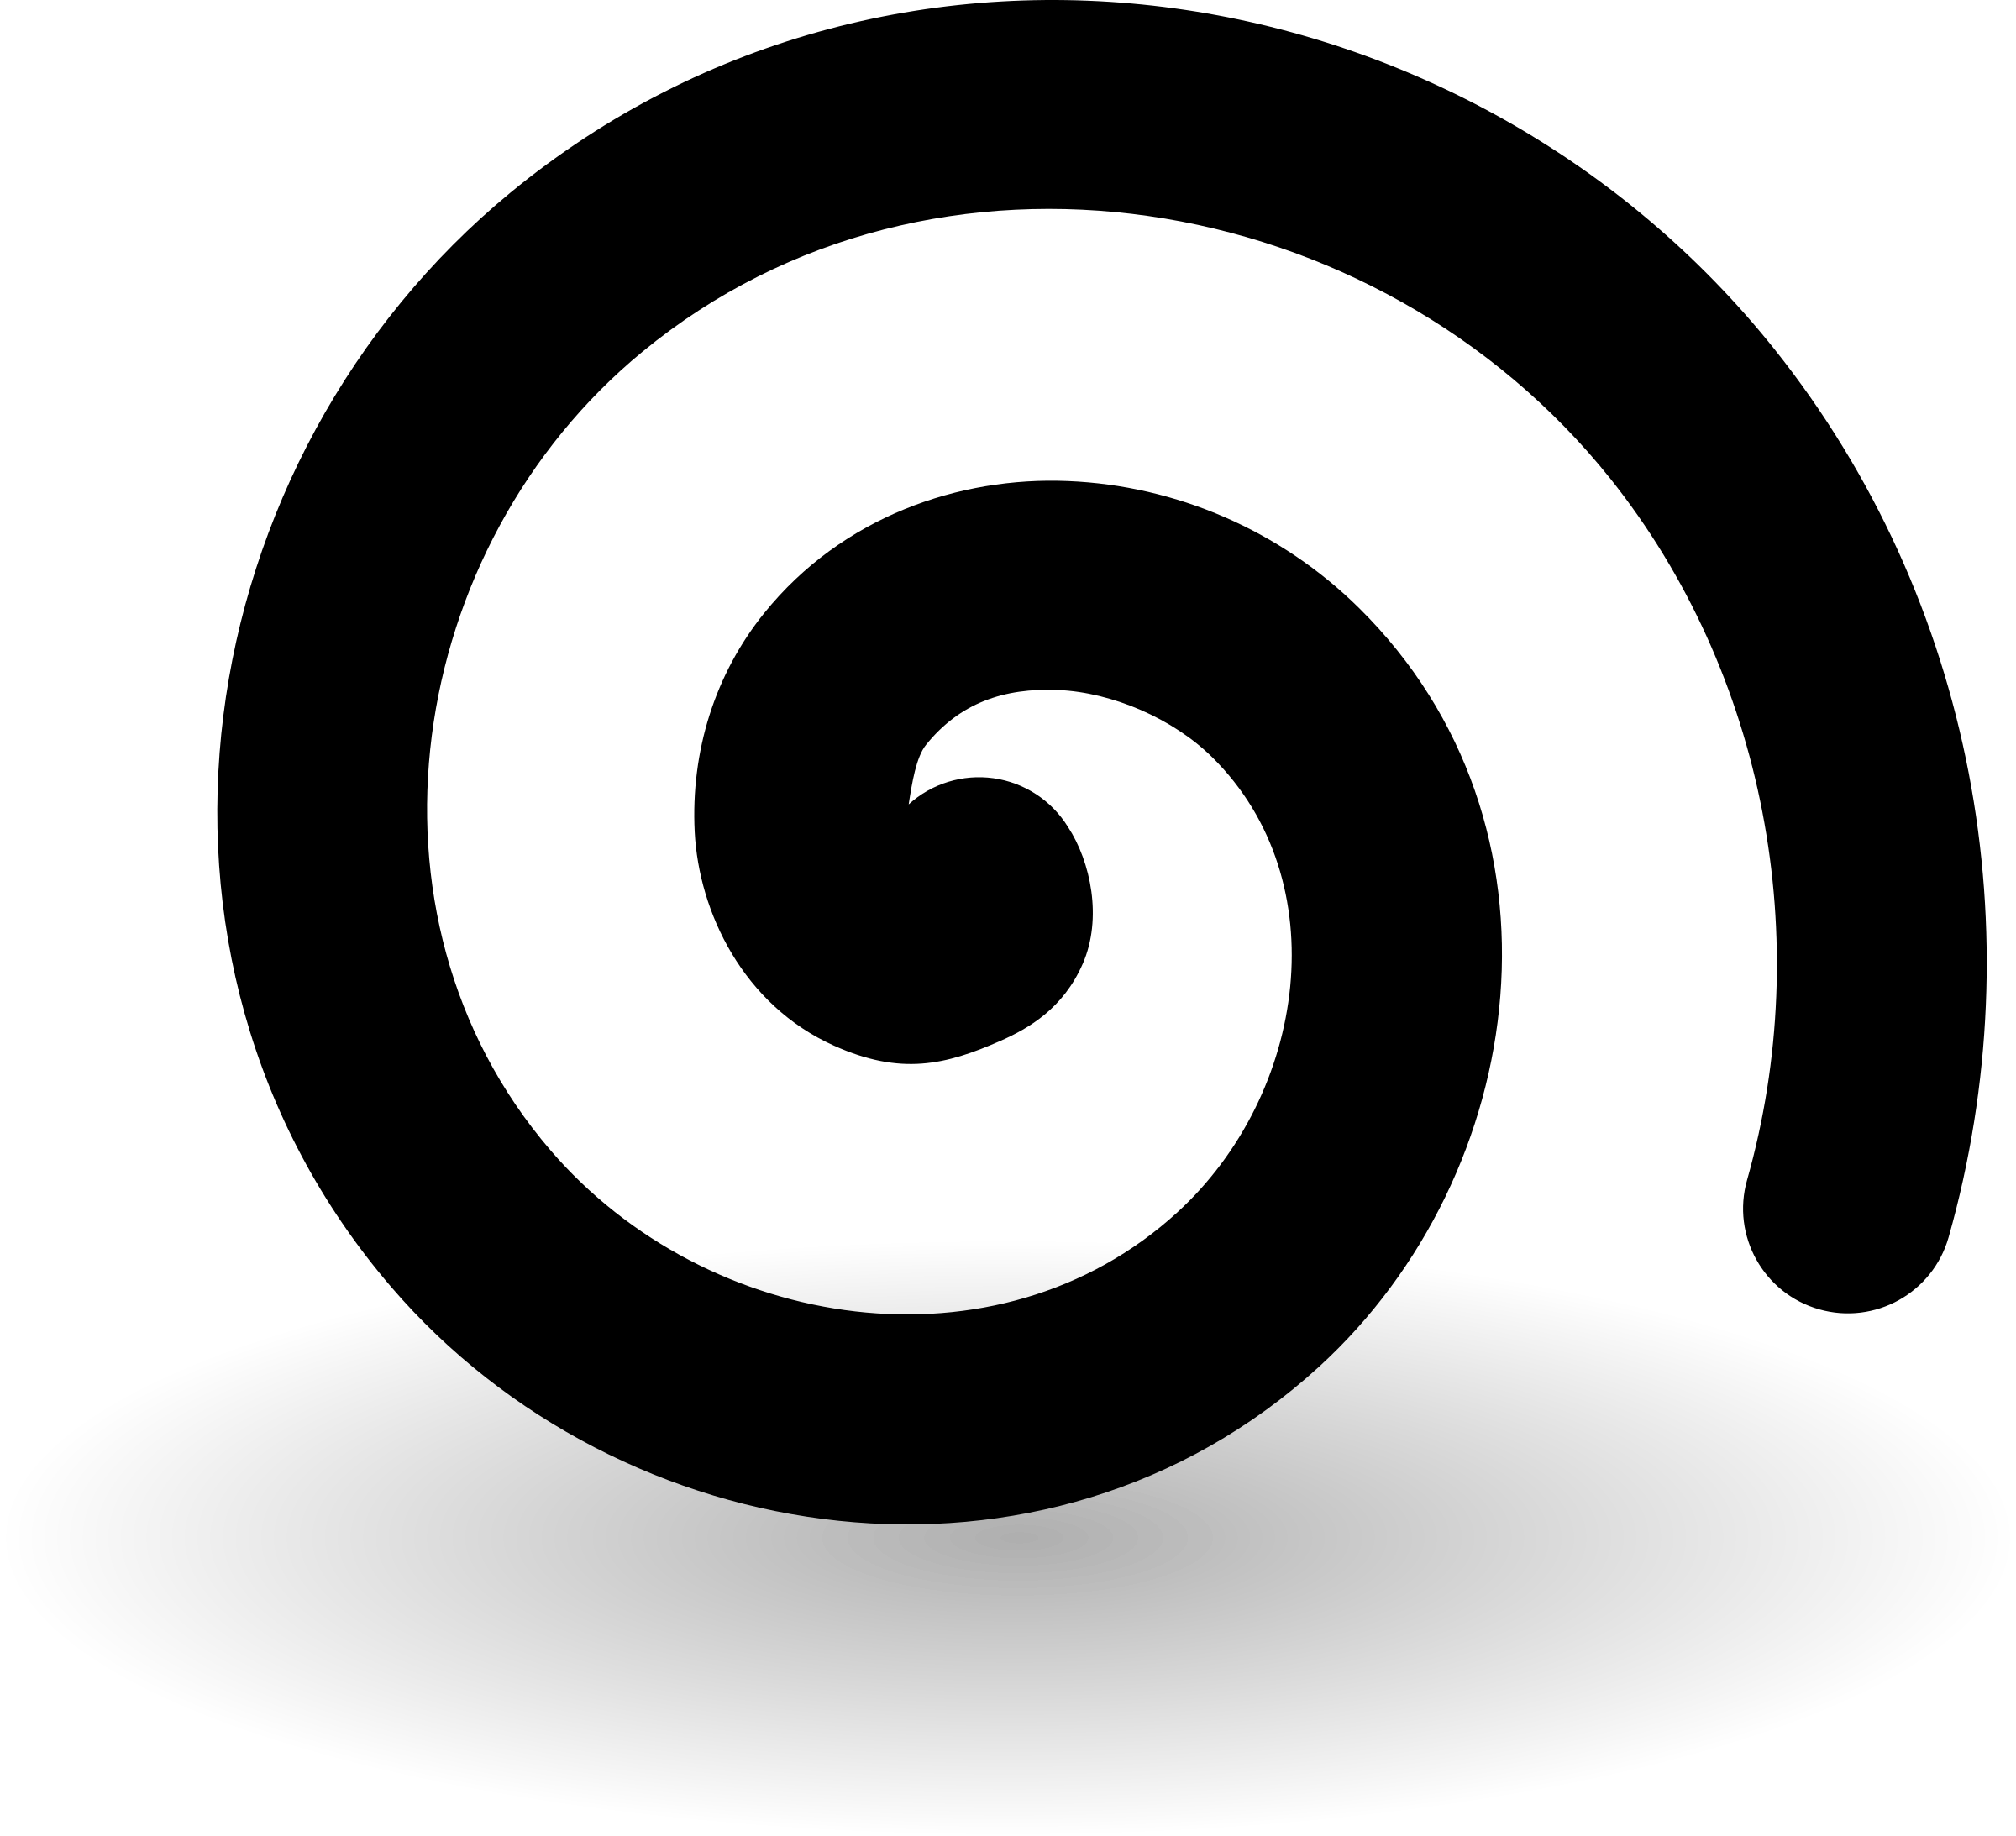 Spiral clipart simple Clipart Spiral Spiral